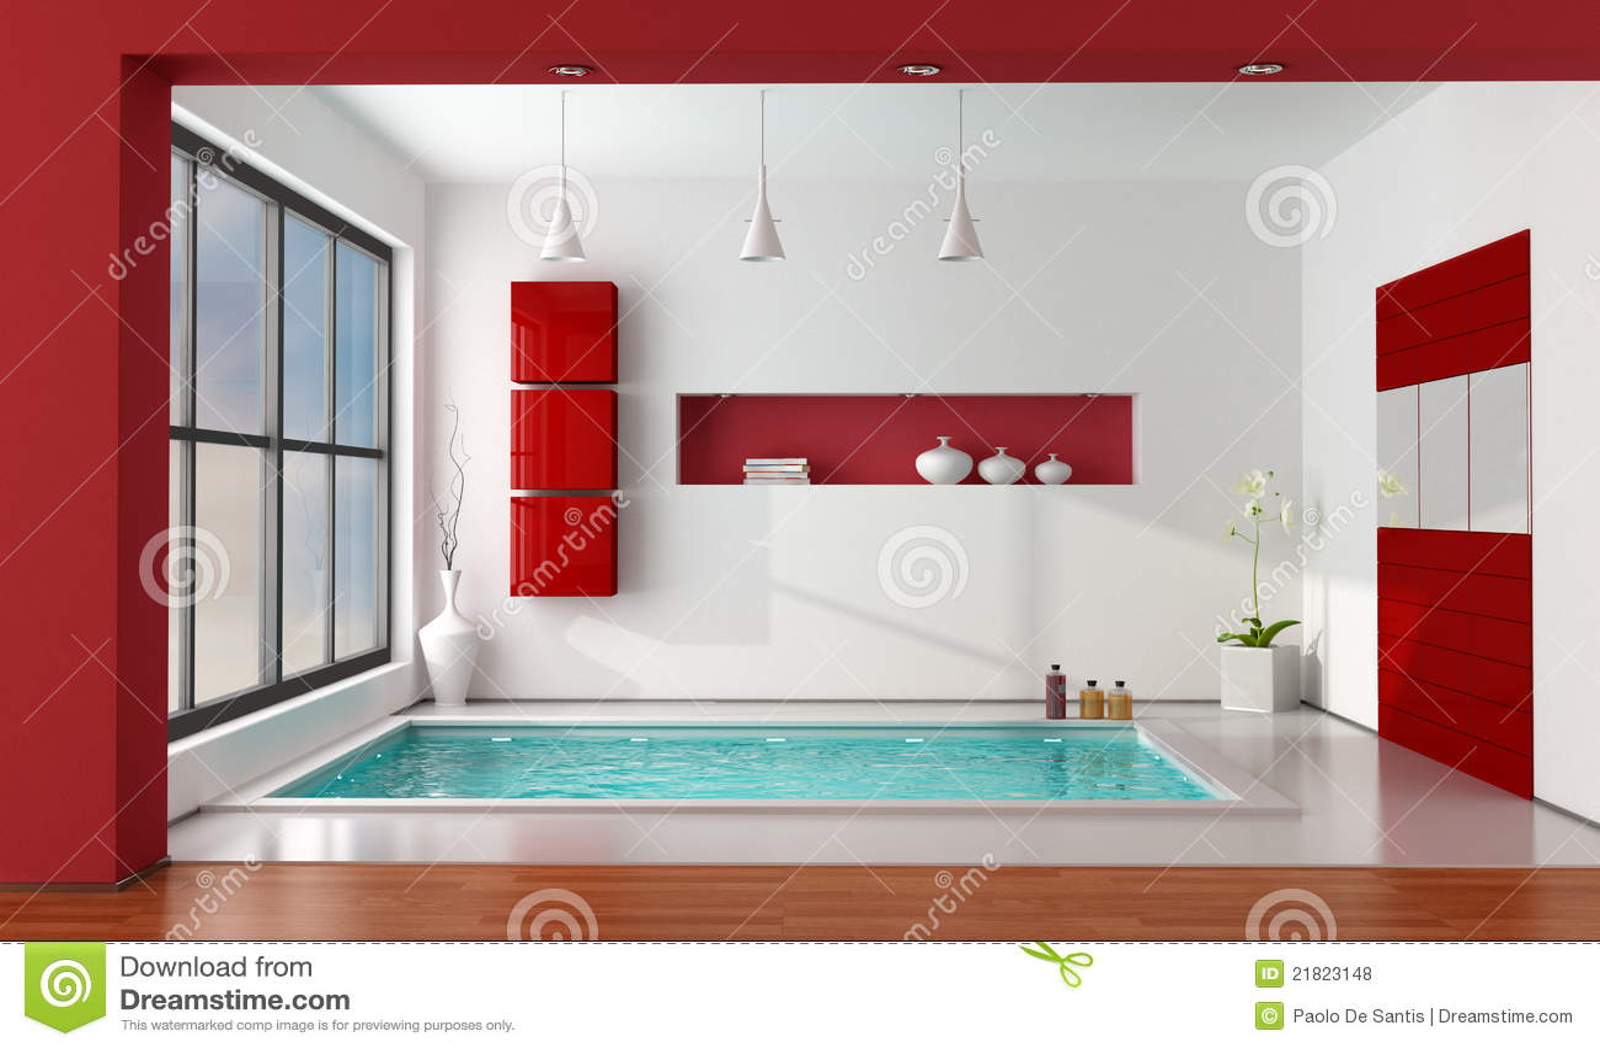 Salle De Bain Nevada ~ salle de bain rouge et blanche salle de bain rouge blanc et gris u